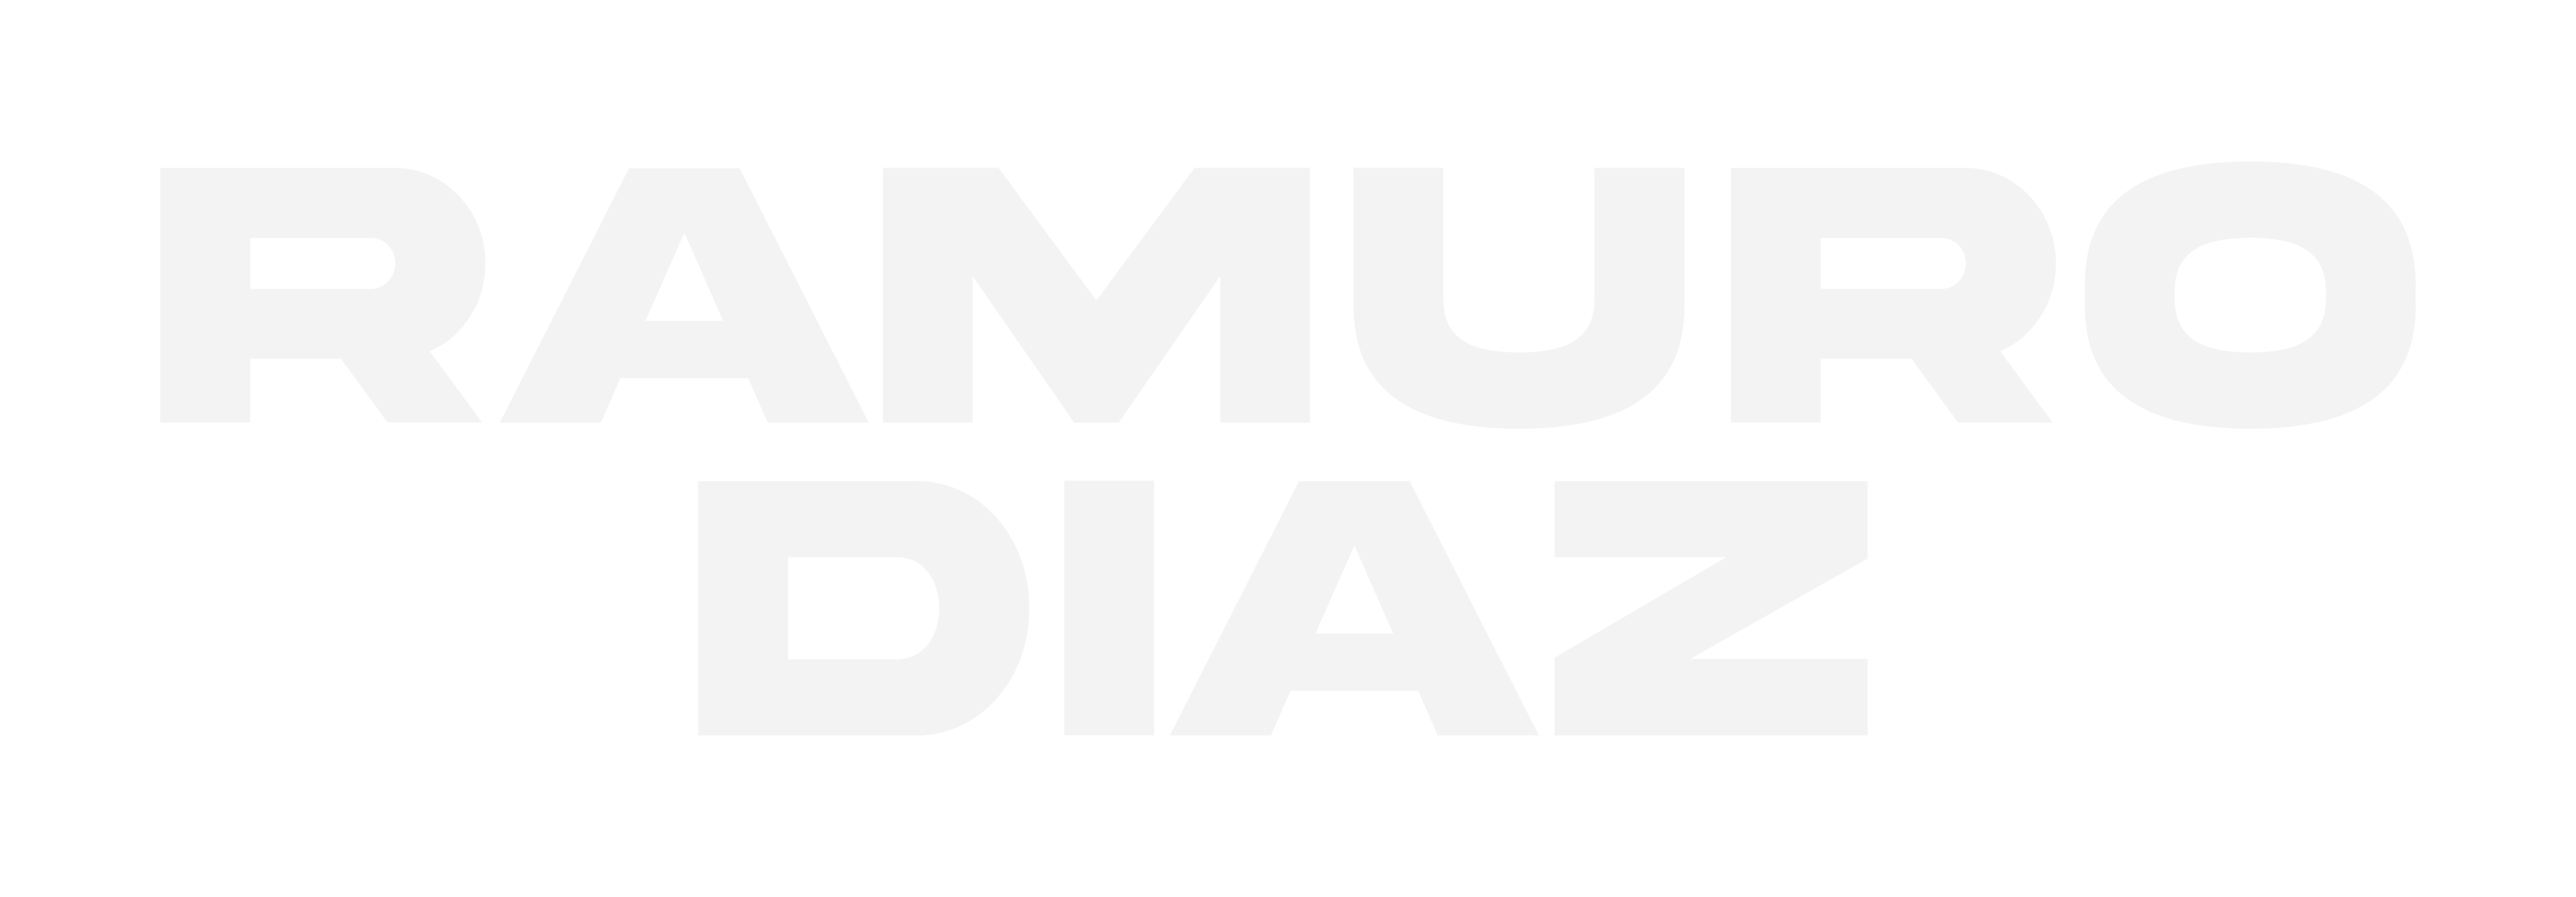 Ramuro Diaz 2021 Logo